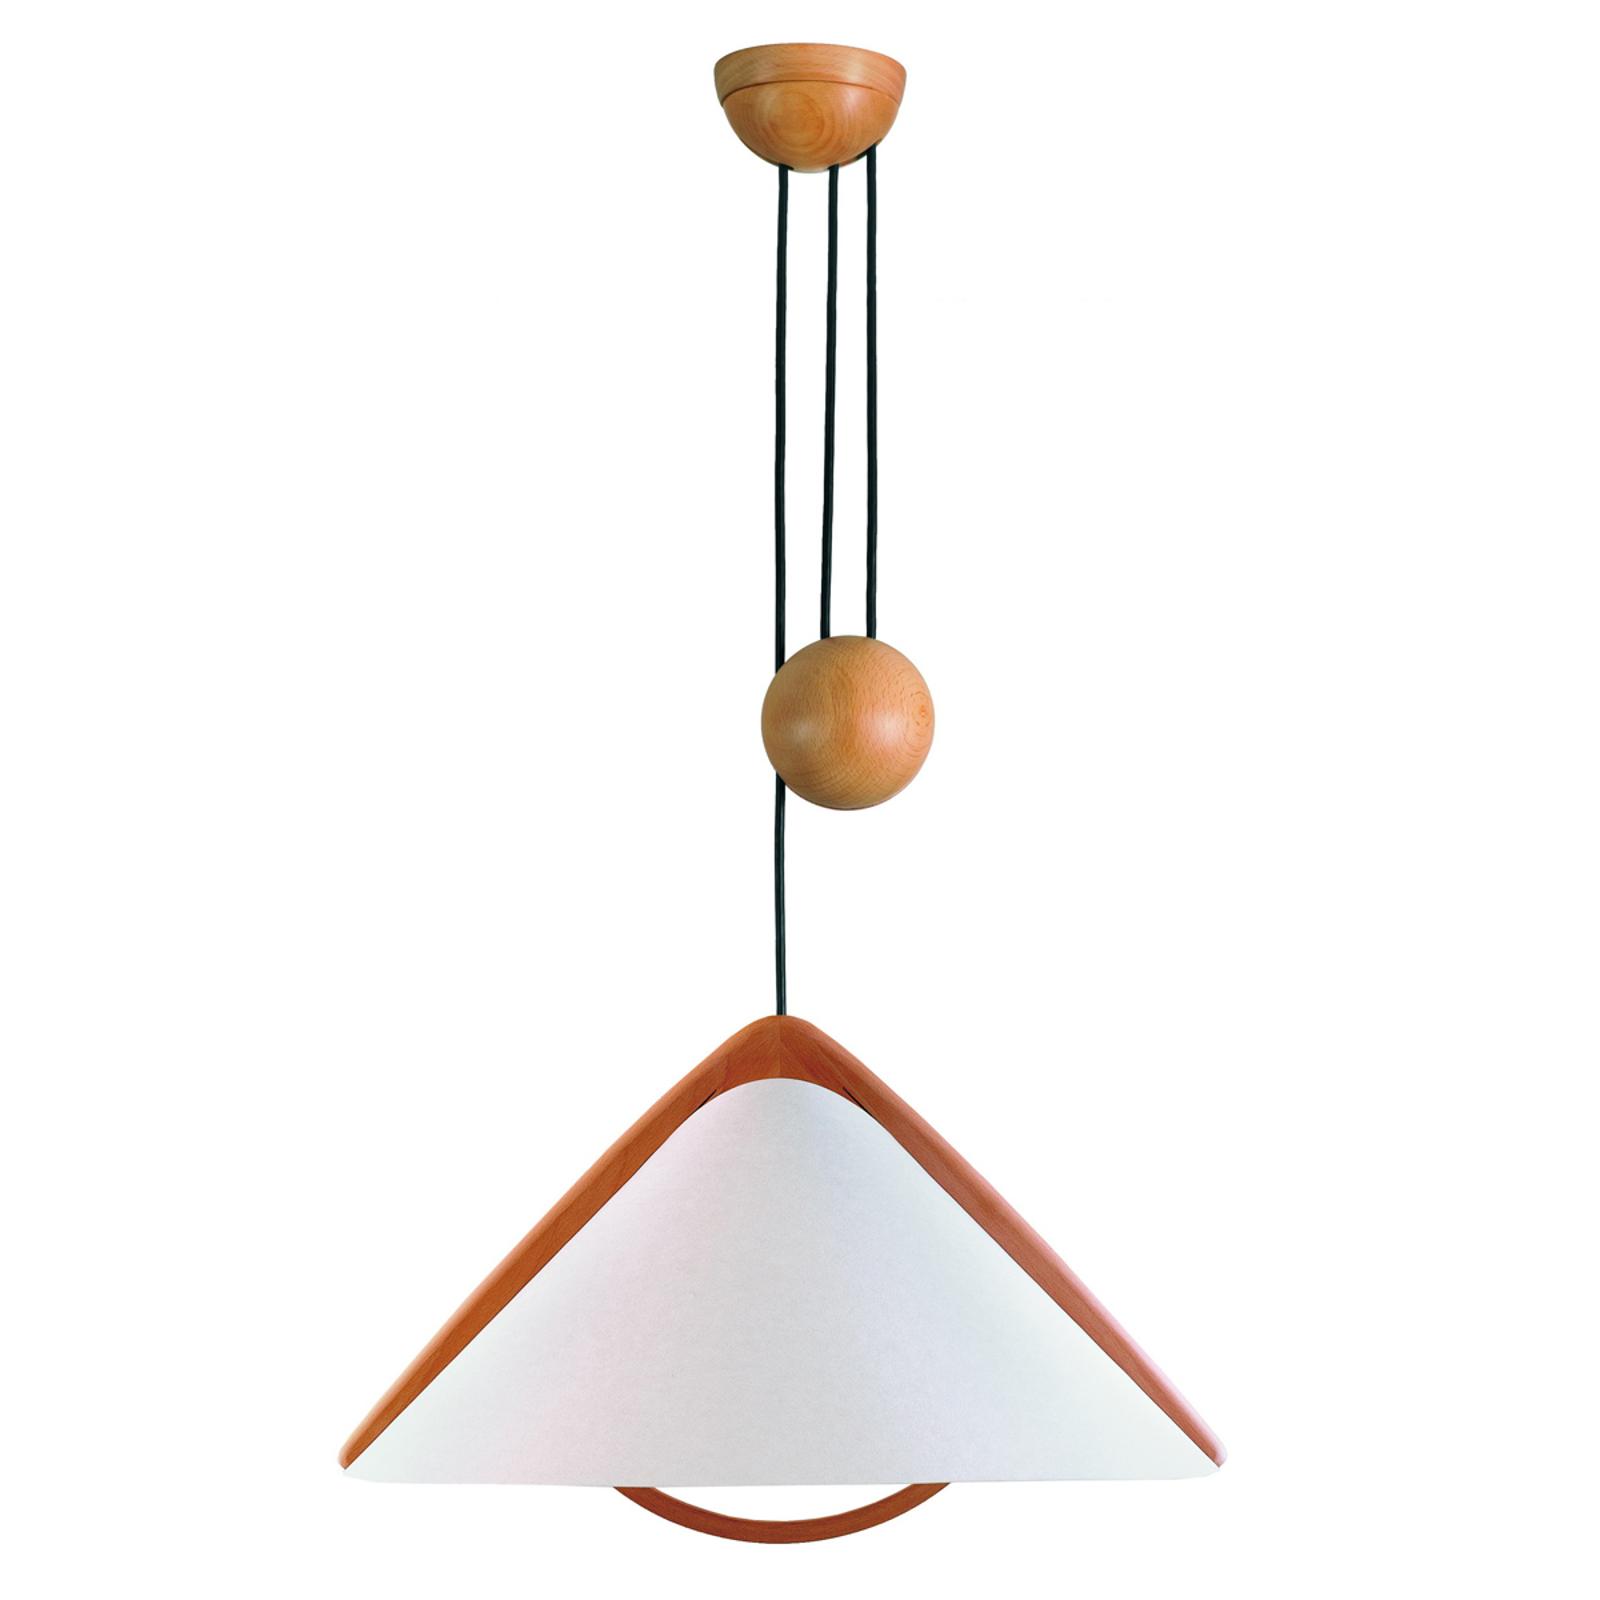 Lámpara regulable en altura Pila, pantalla lunopal